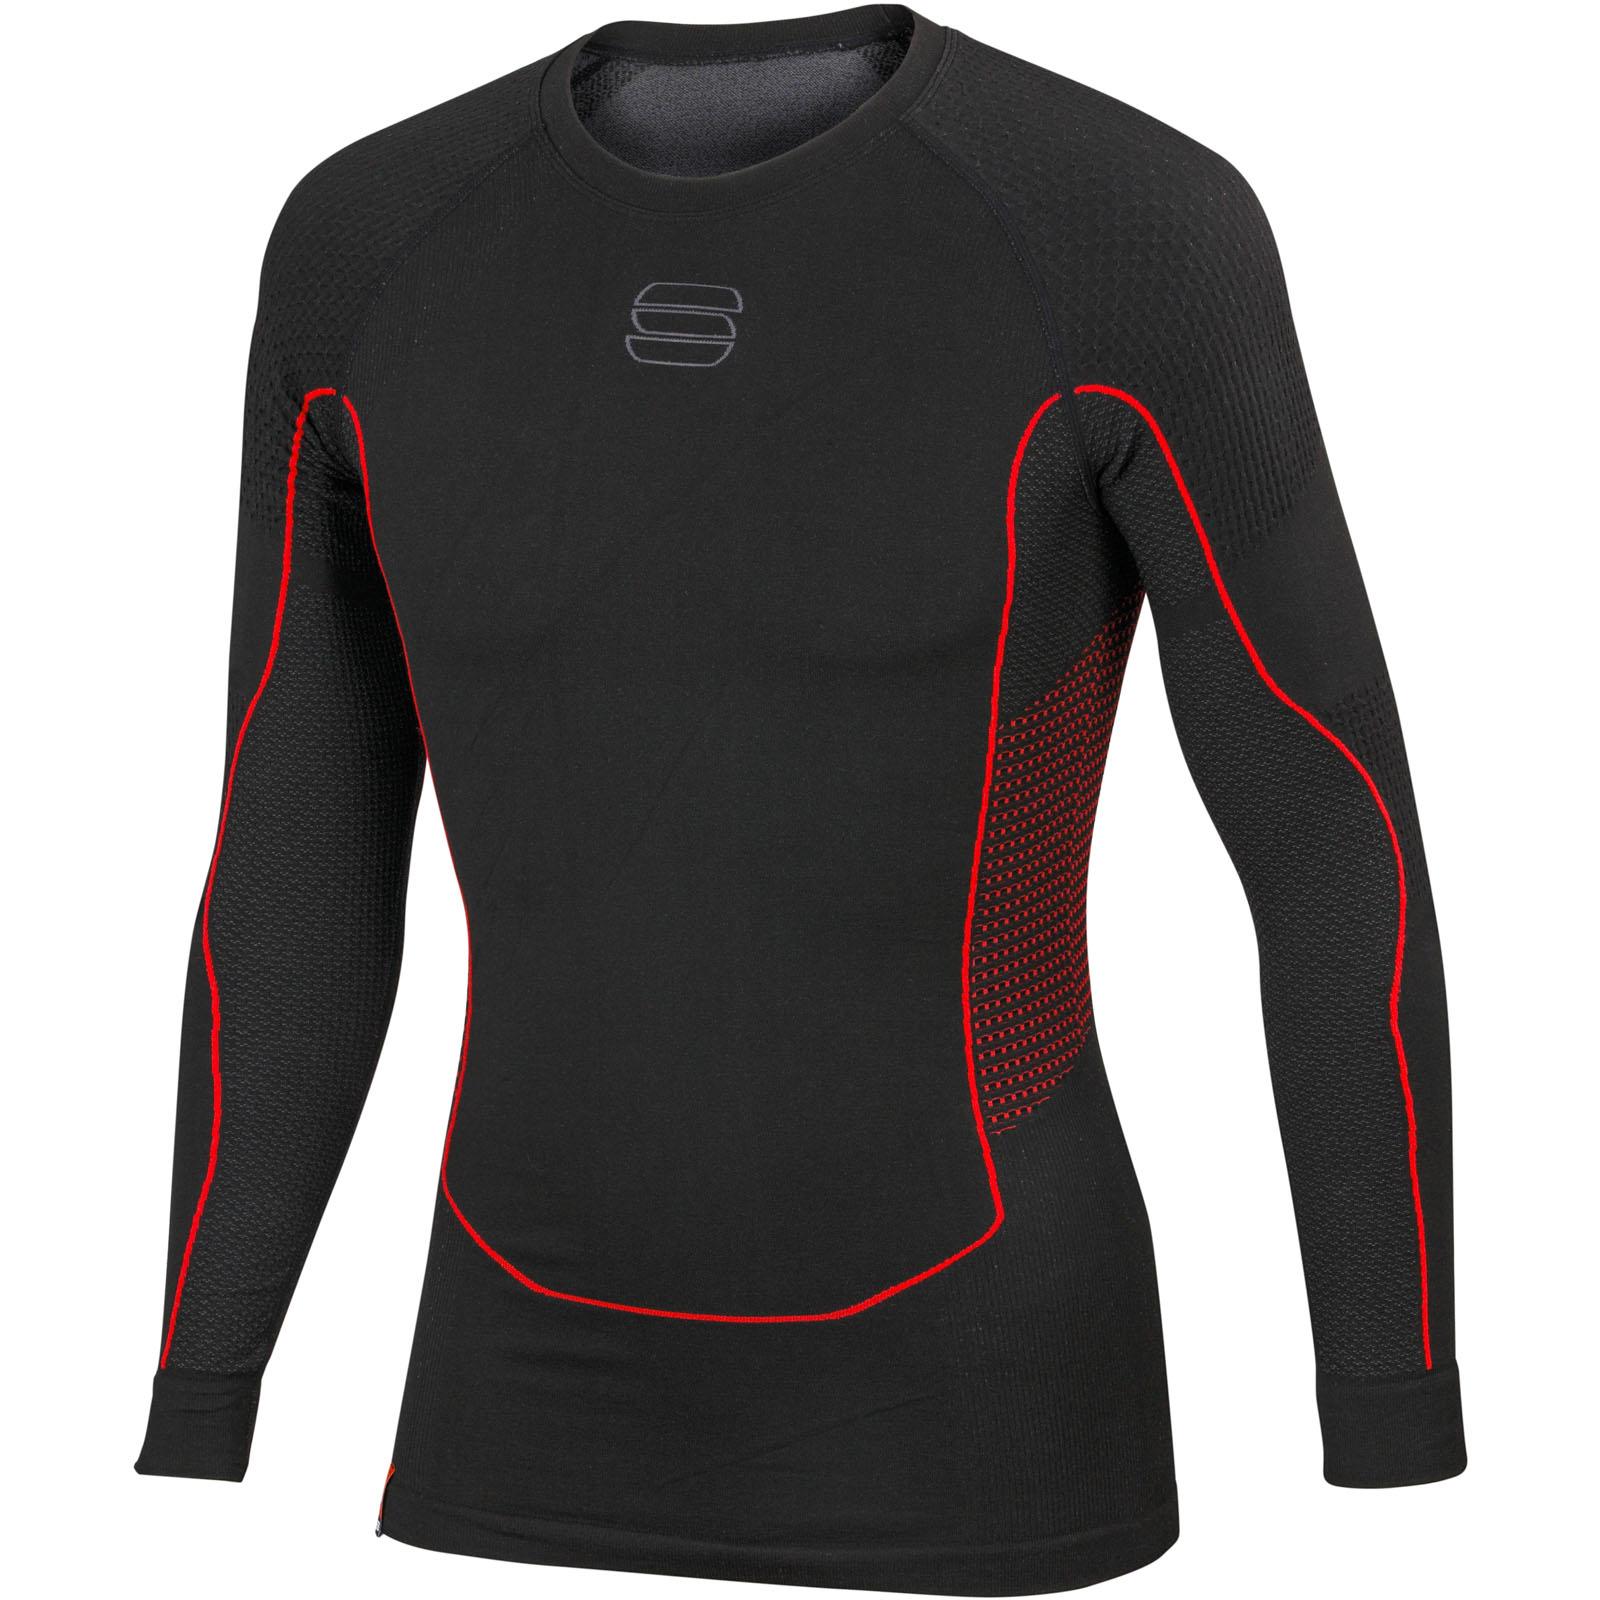 f9db4de68418 Sportful 2nd Skin Tričko s dlhým rukávom čierne